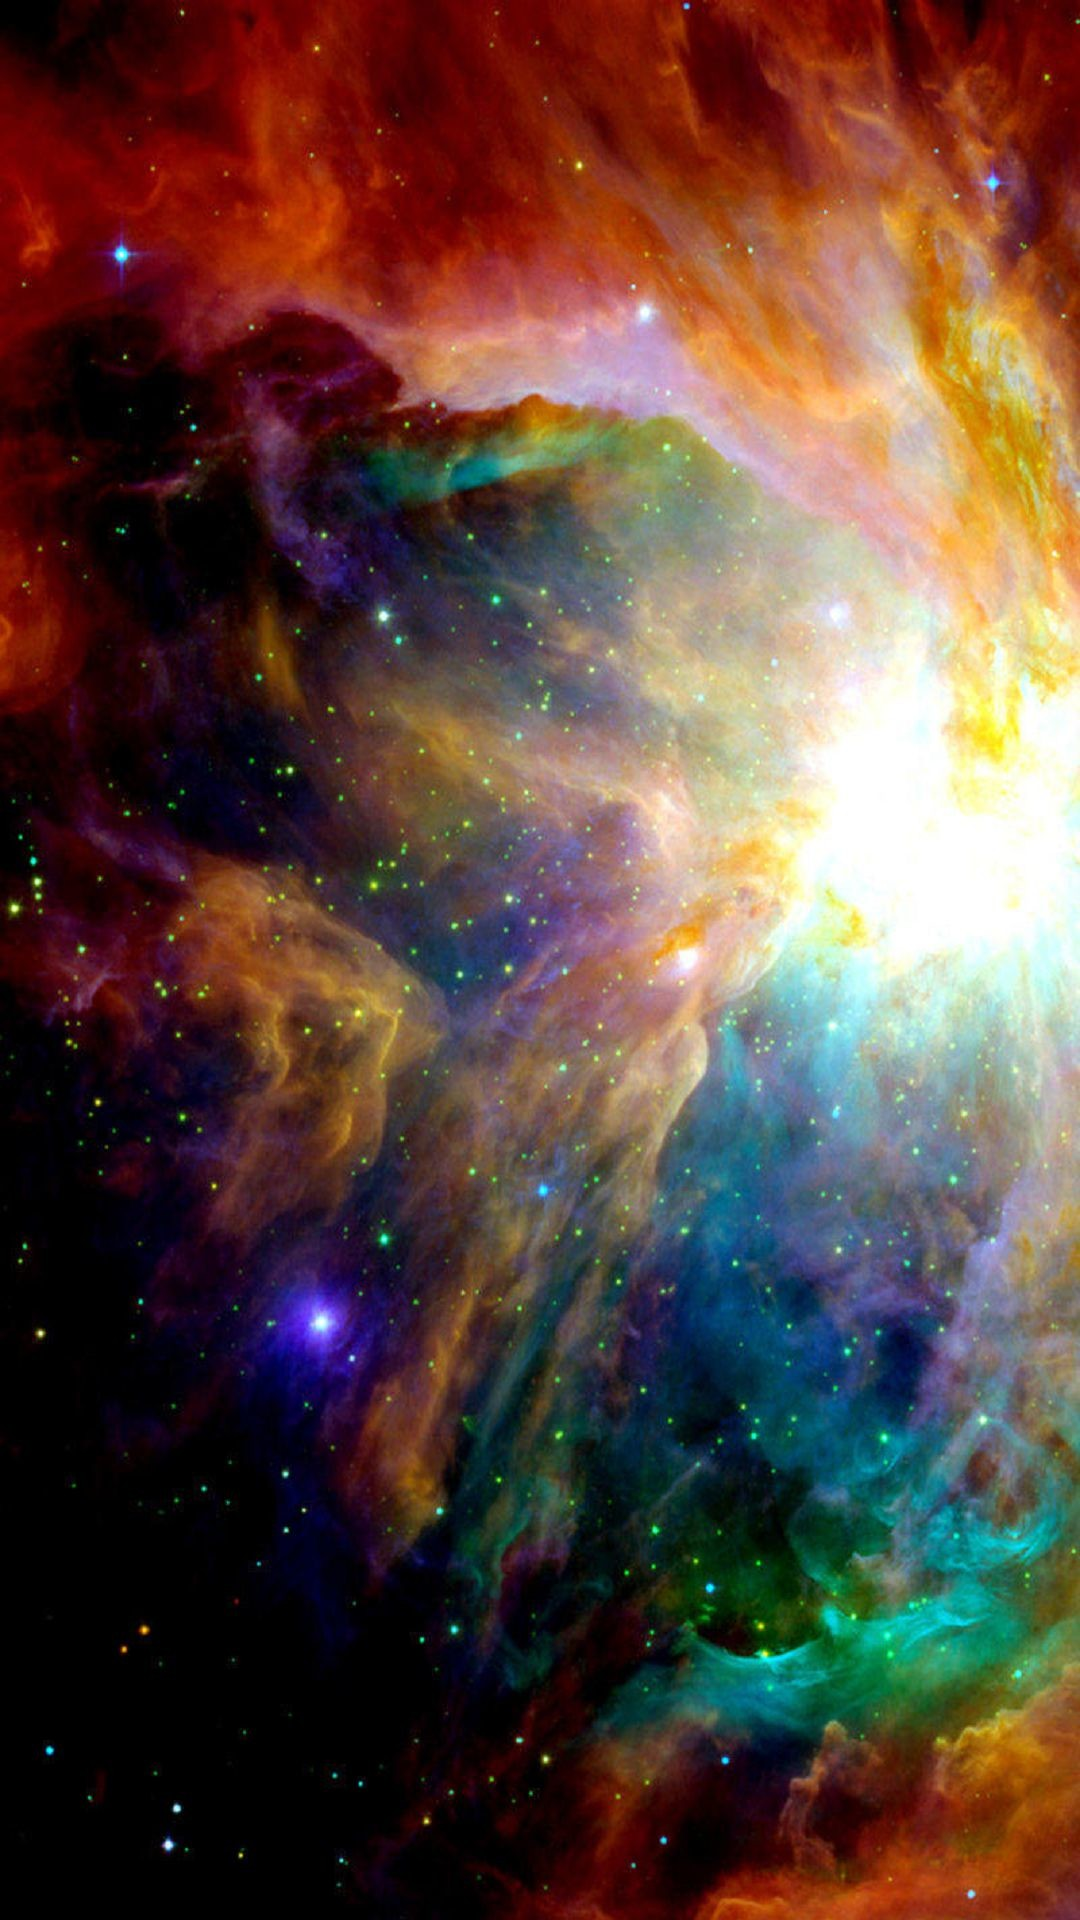 orion-nebula-hubble-wallpaper-wallpaper-4.jpg (1080×